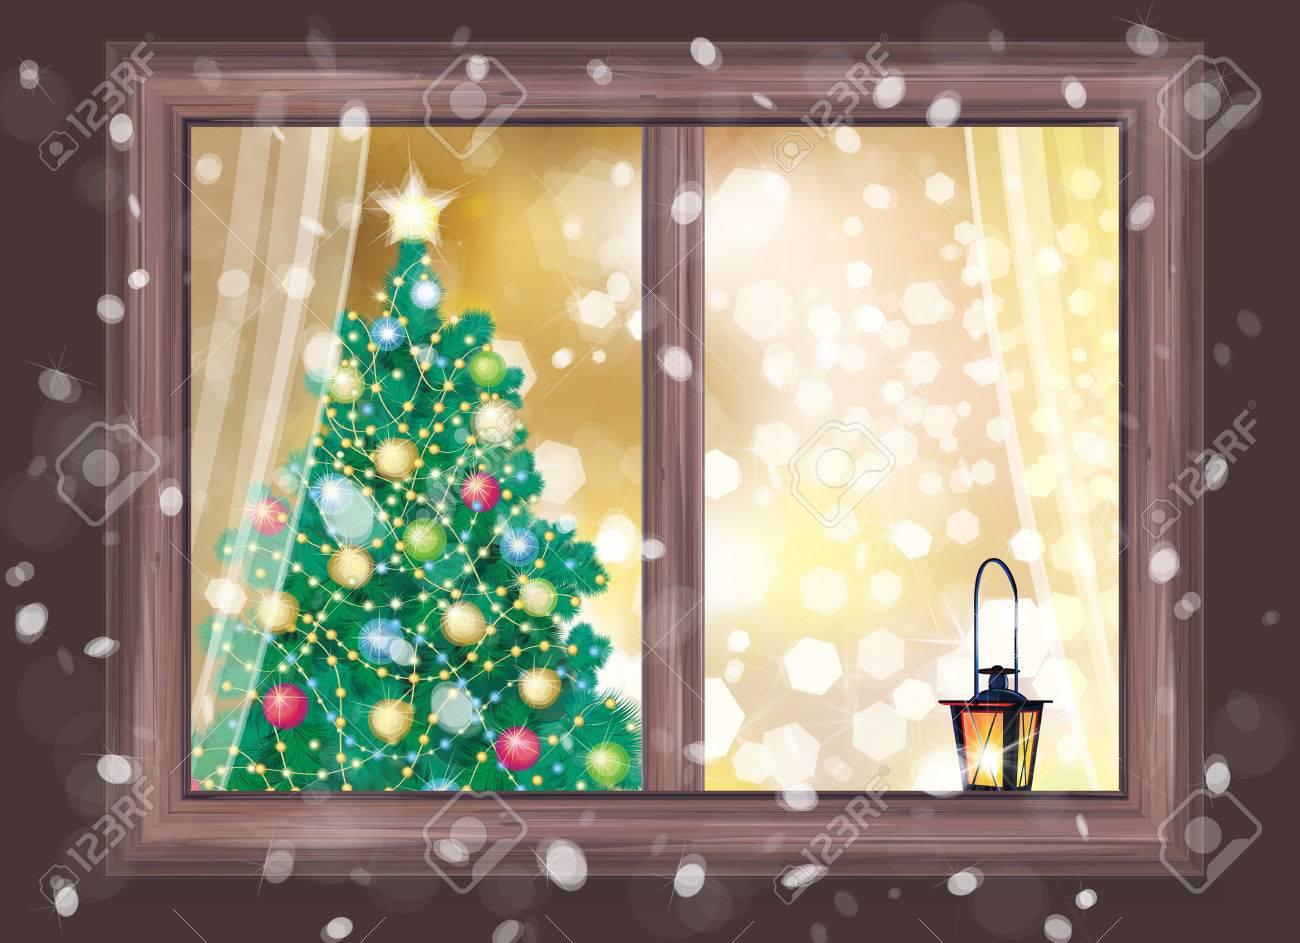 Vector winter night scene of window with Christmas tree and lantern..